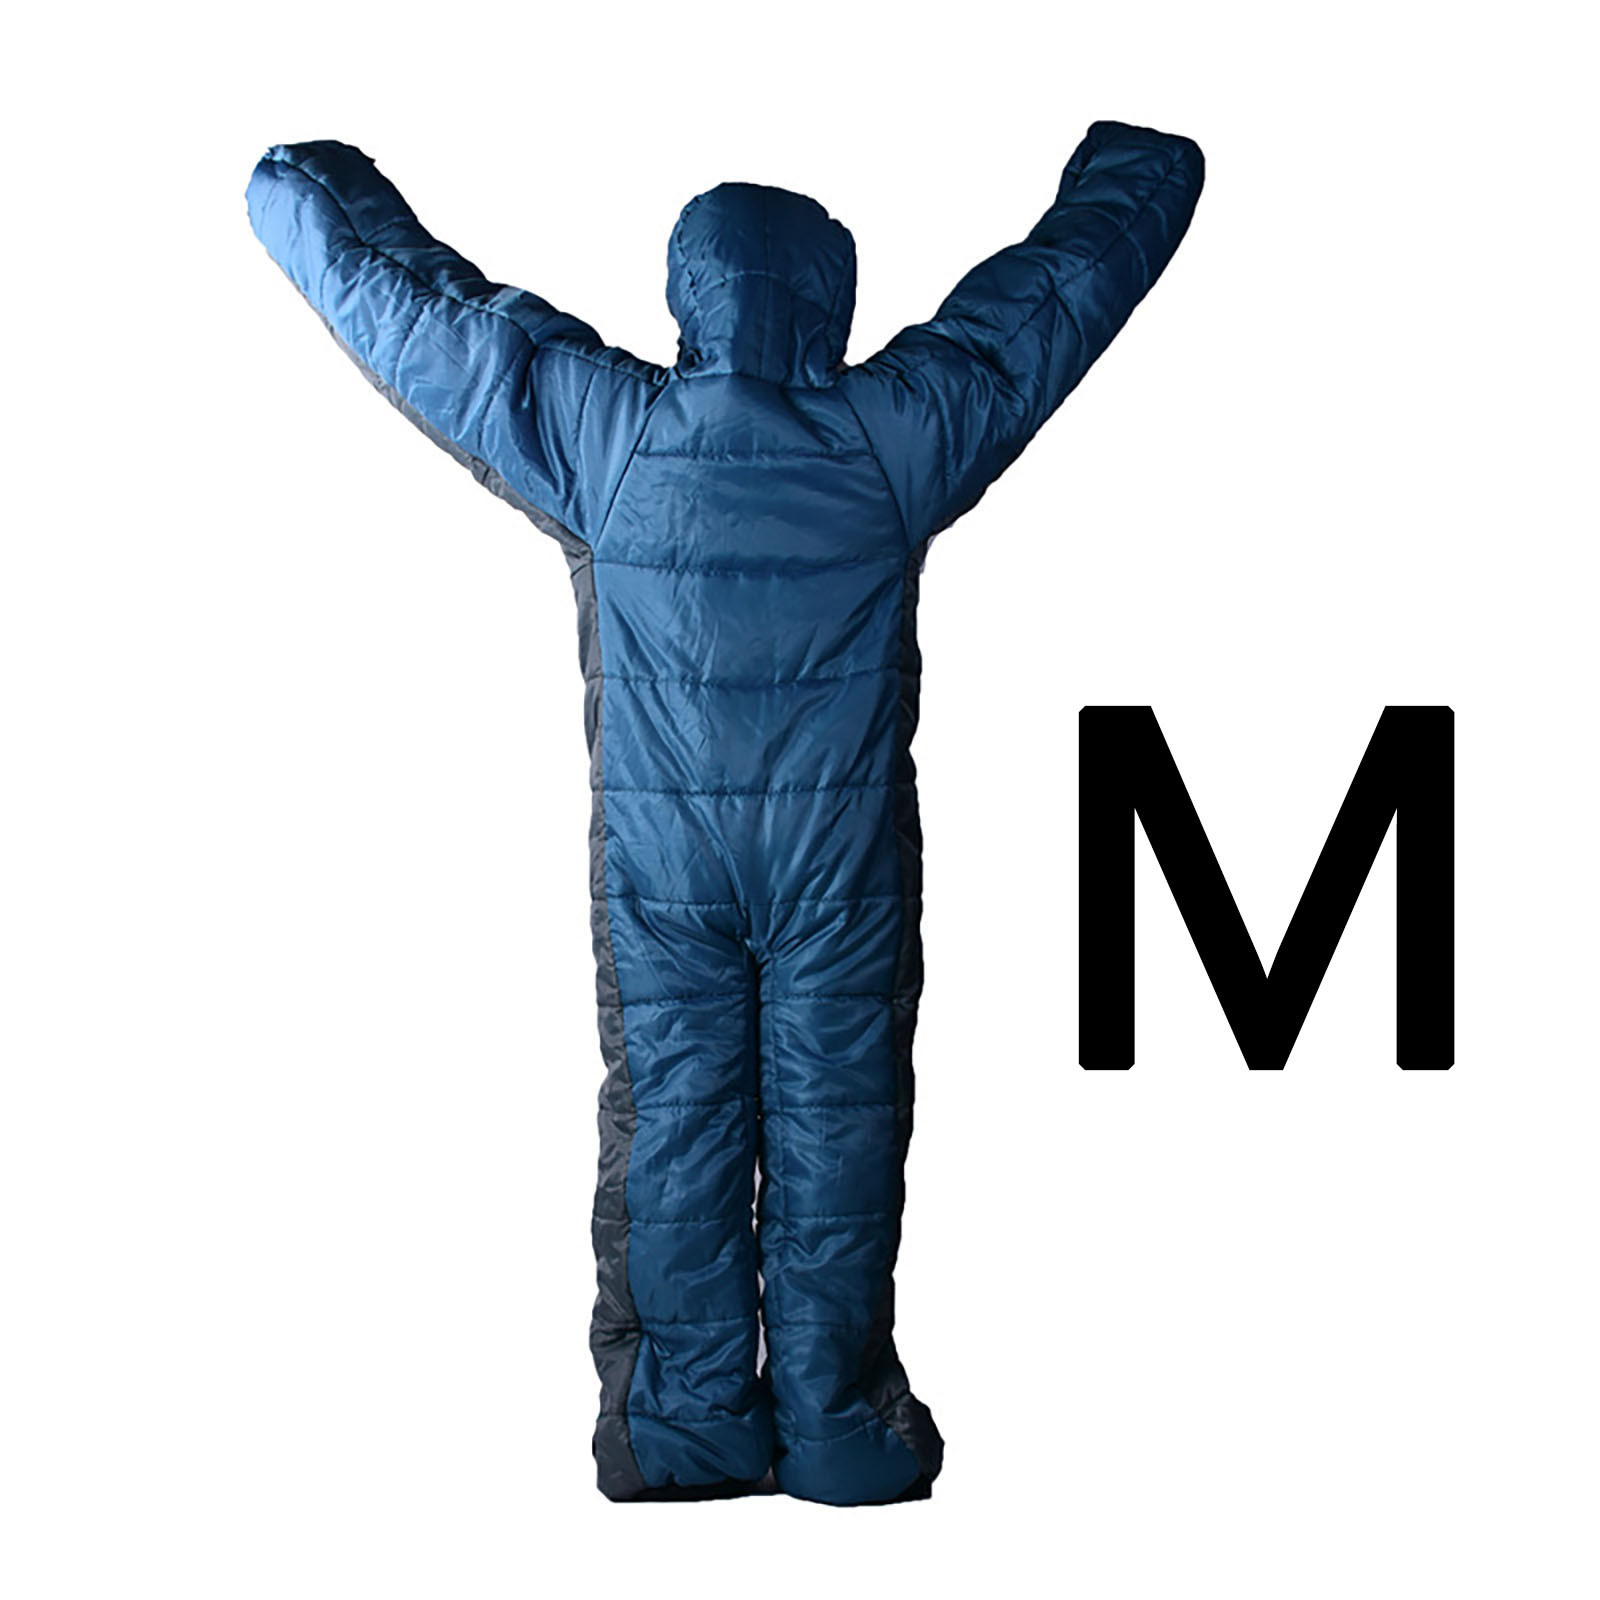 Camping en plein air sac de couchage humain humanoïde marche sac de couchage temporaire repos sommeil imperméable Polyester